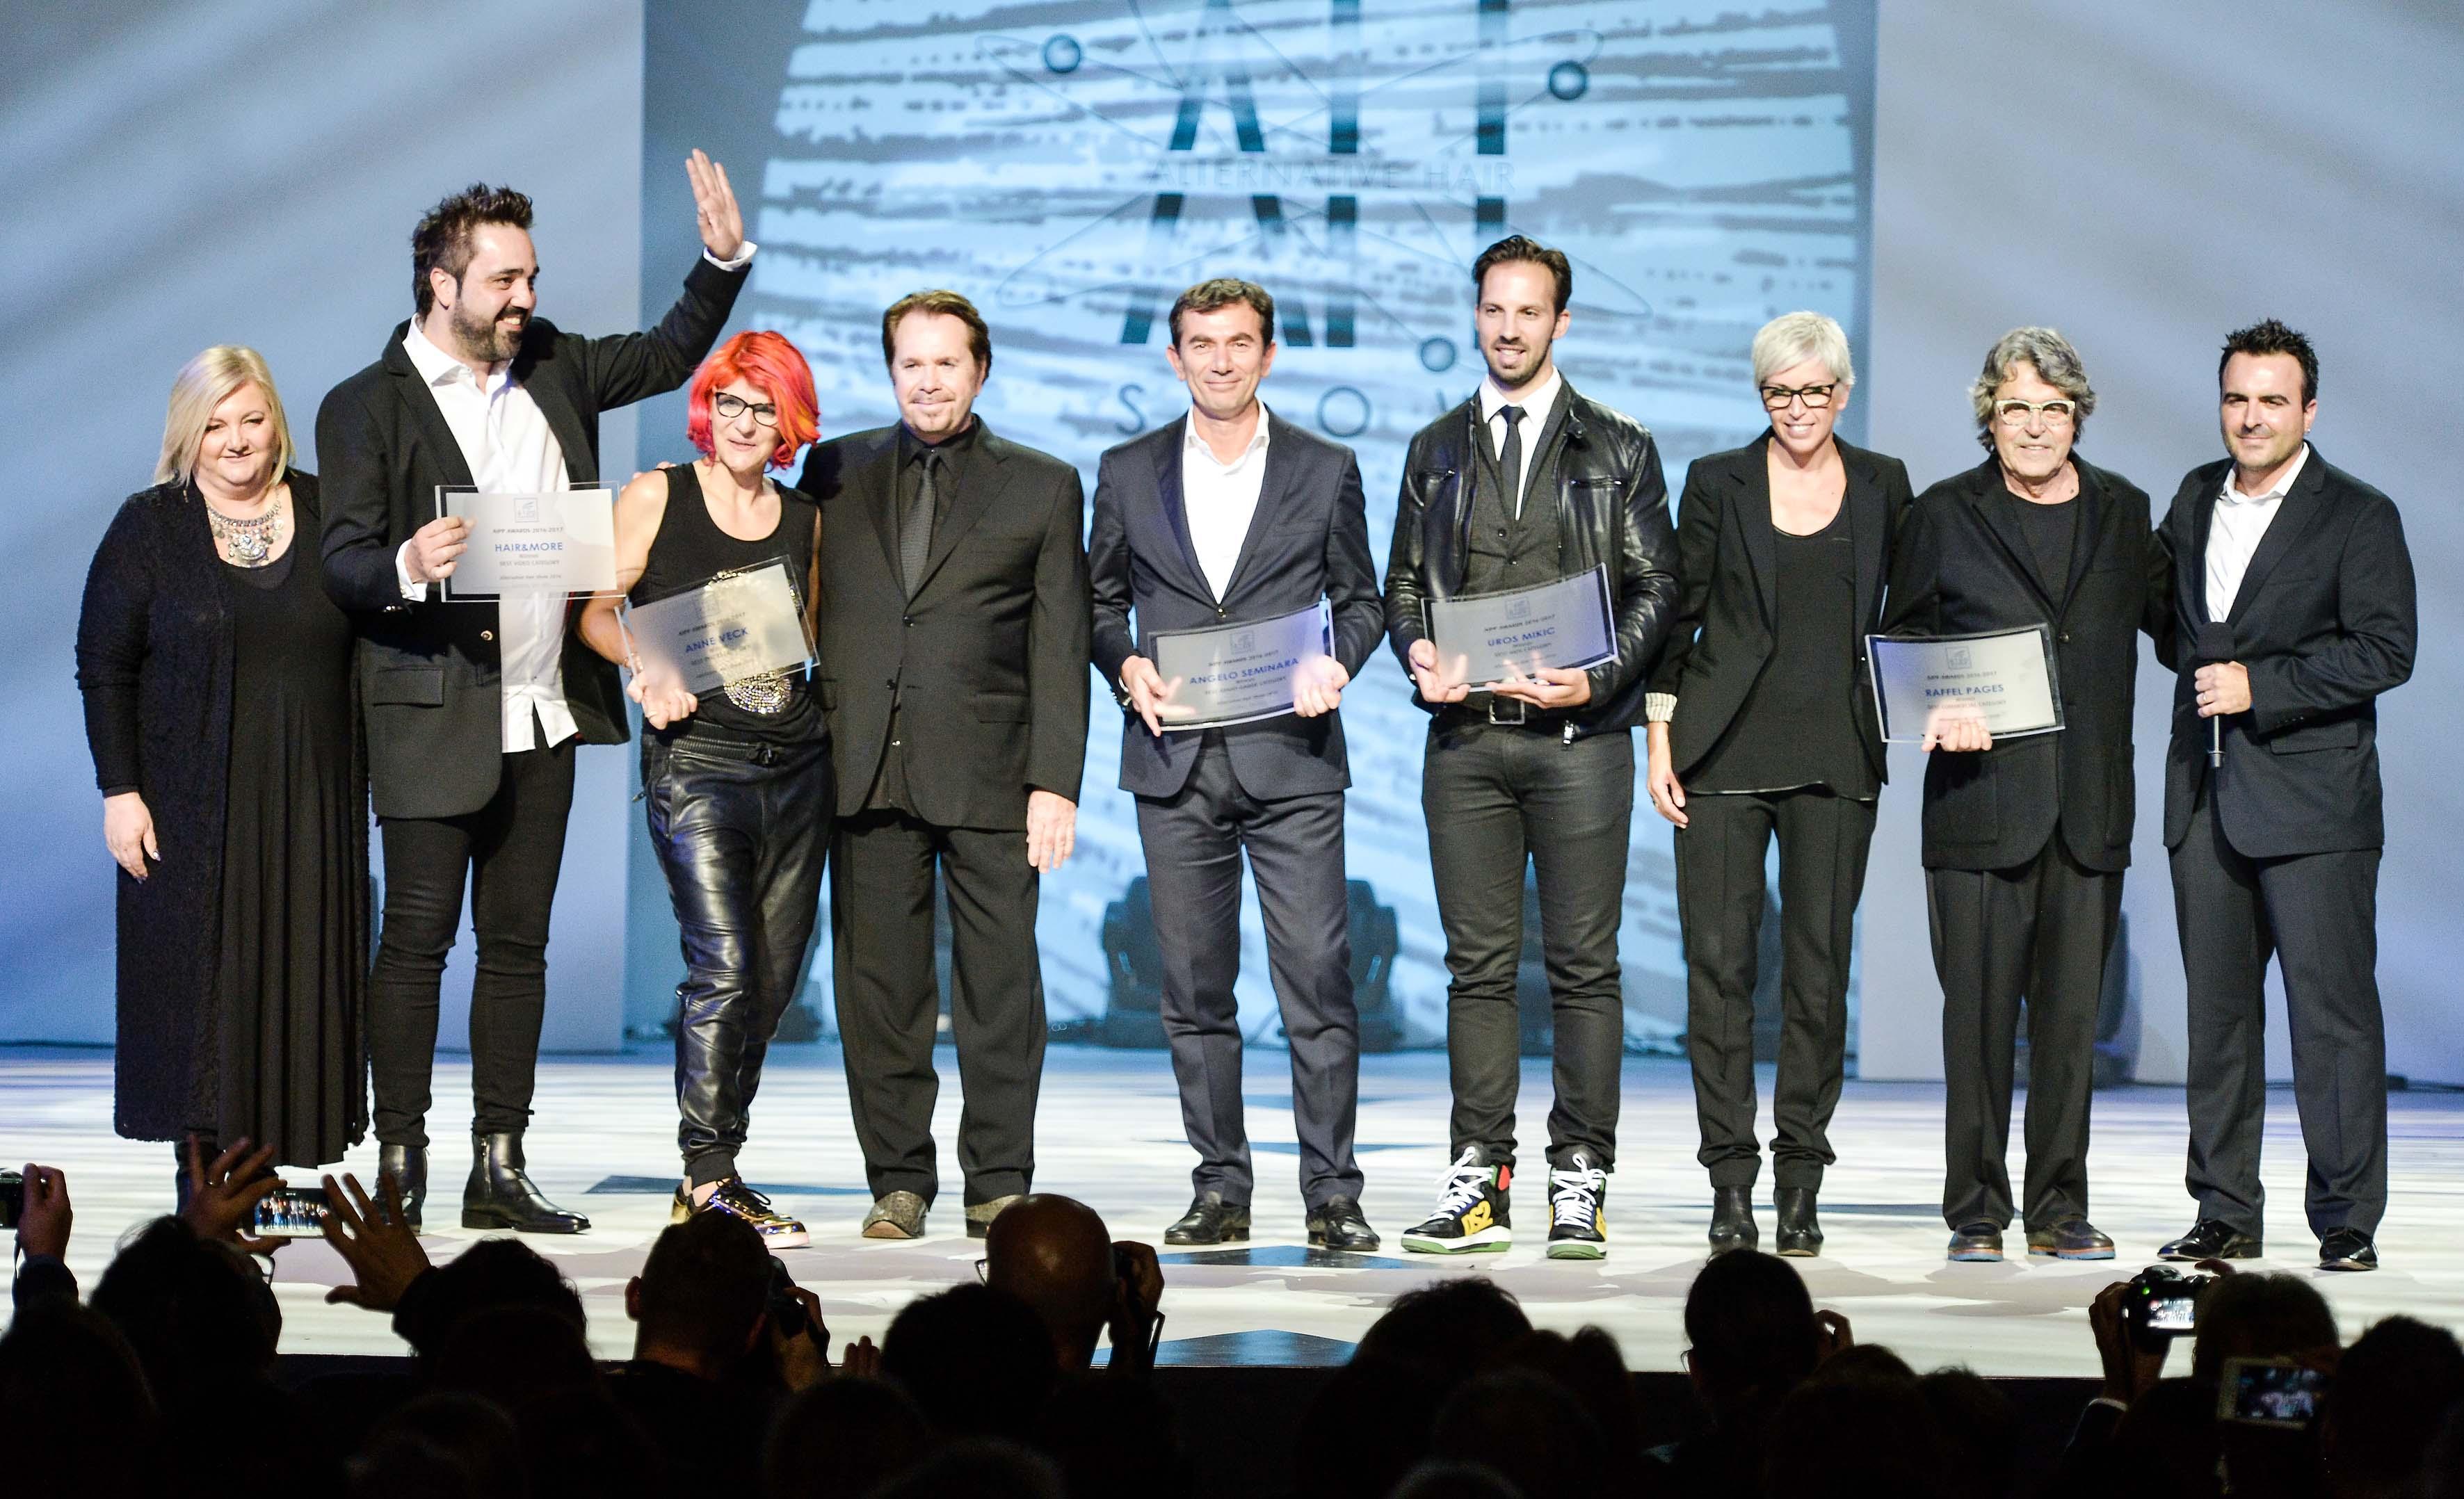 aipp-awards-2016-2017-all-winners